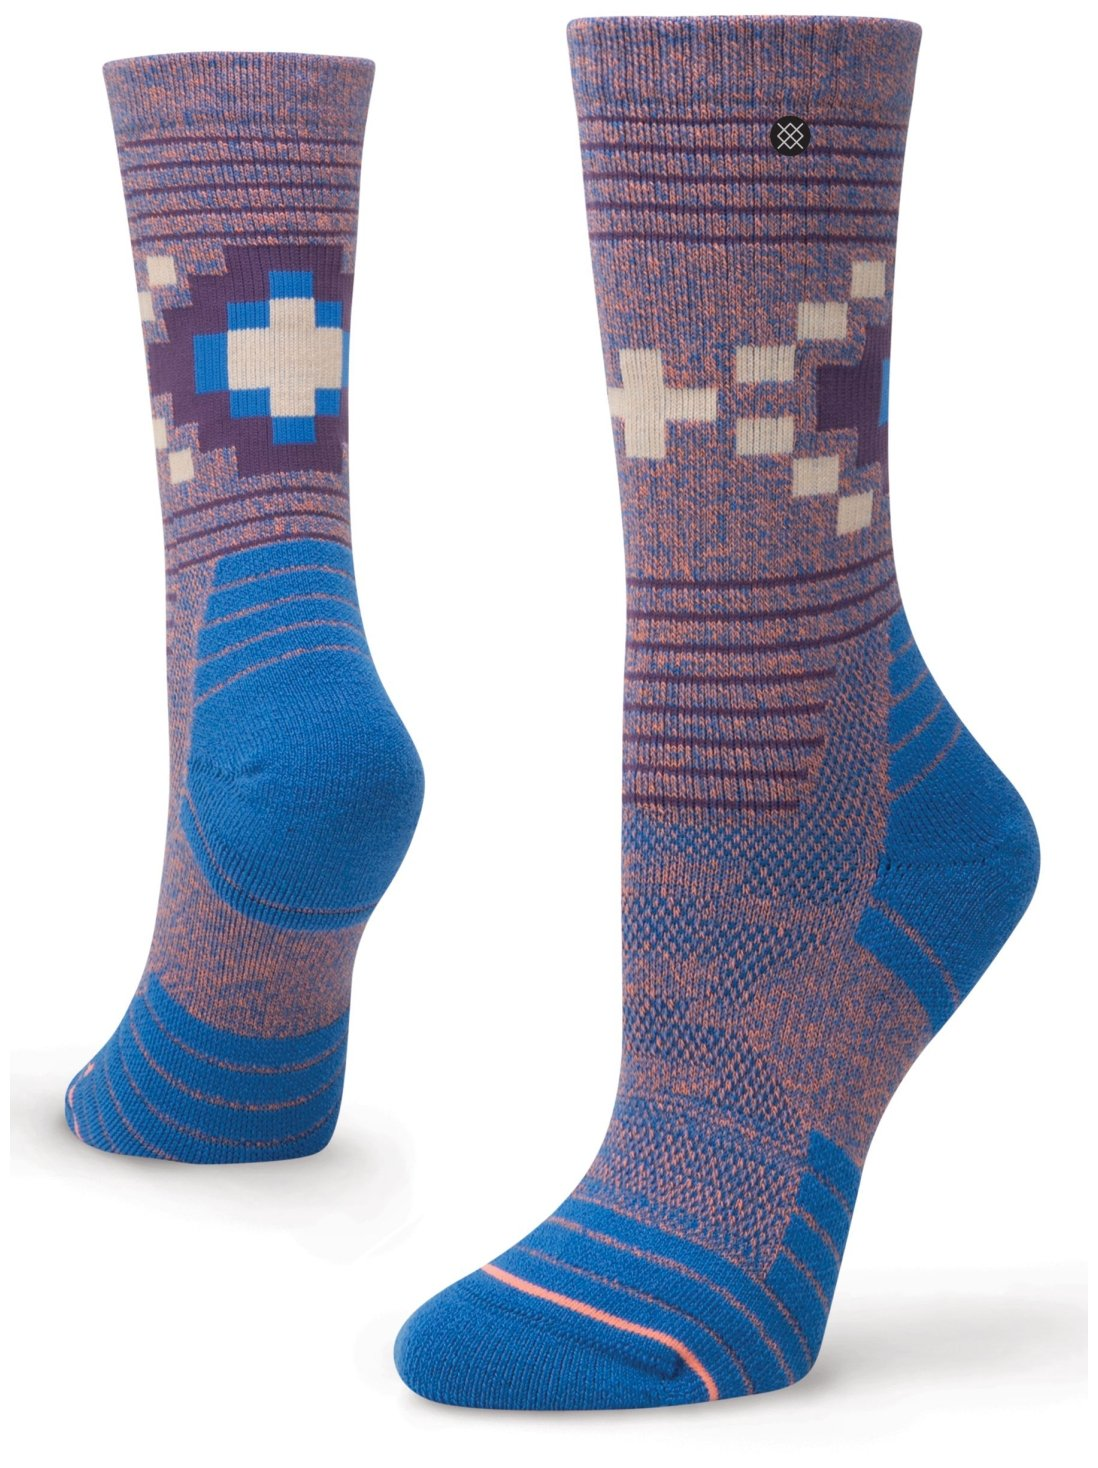 Stance Bezel Outdoor Crew Socks - Women's Blue Medium